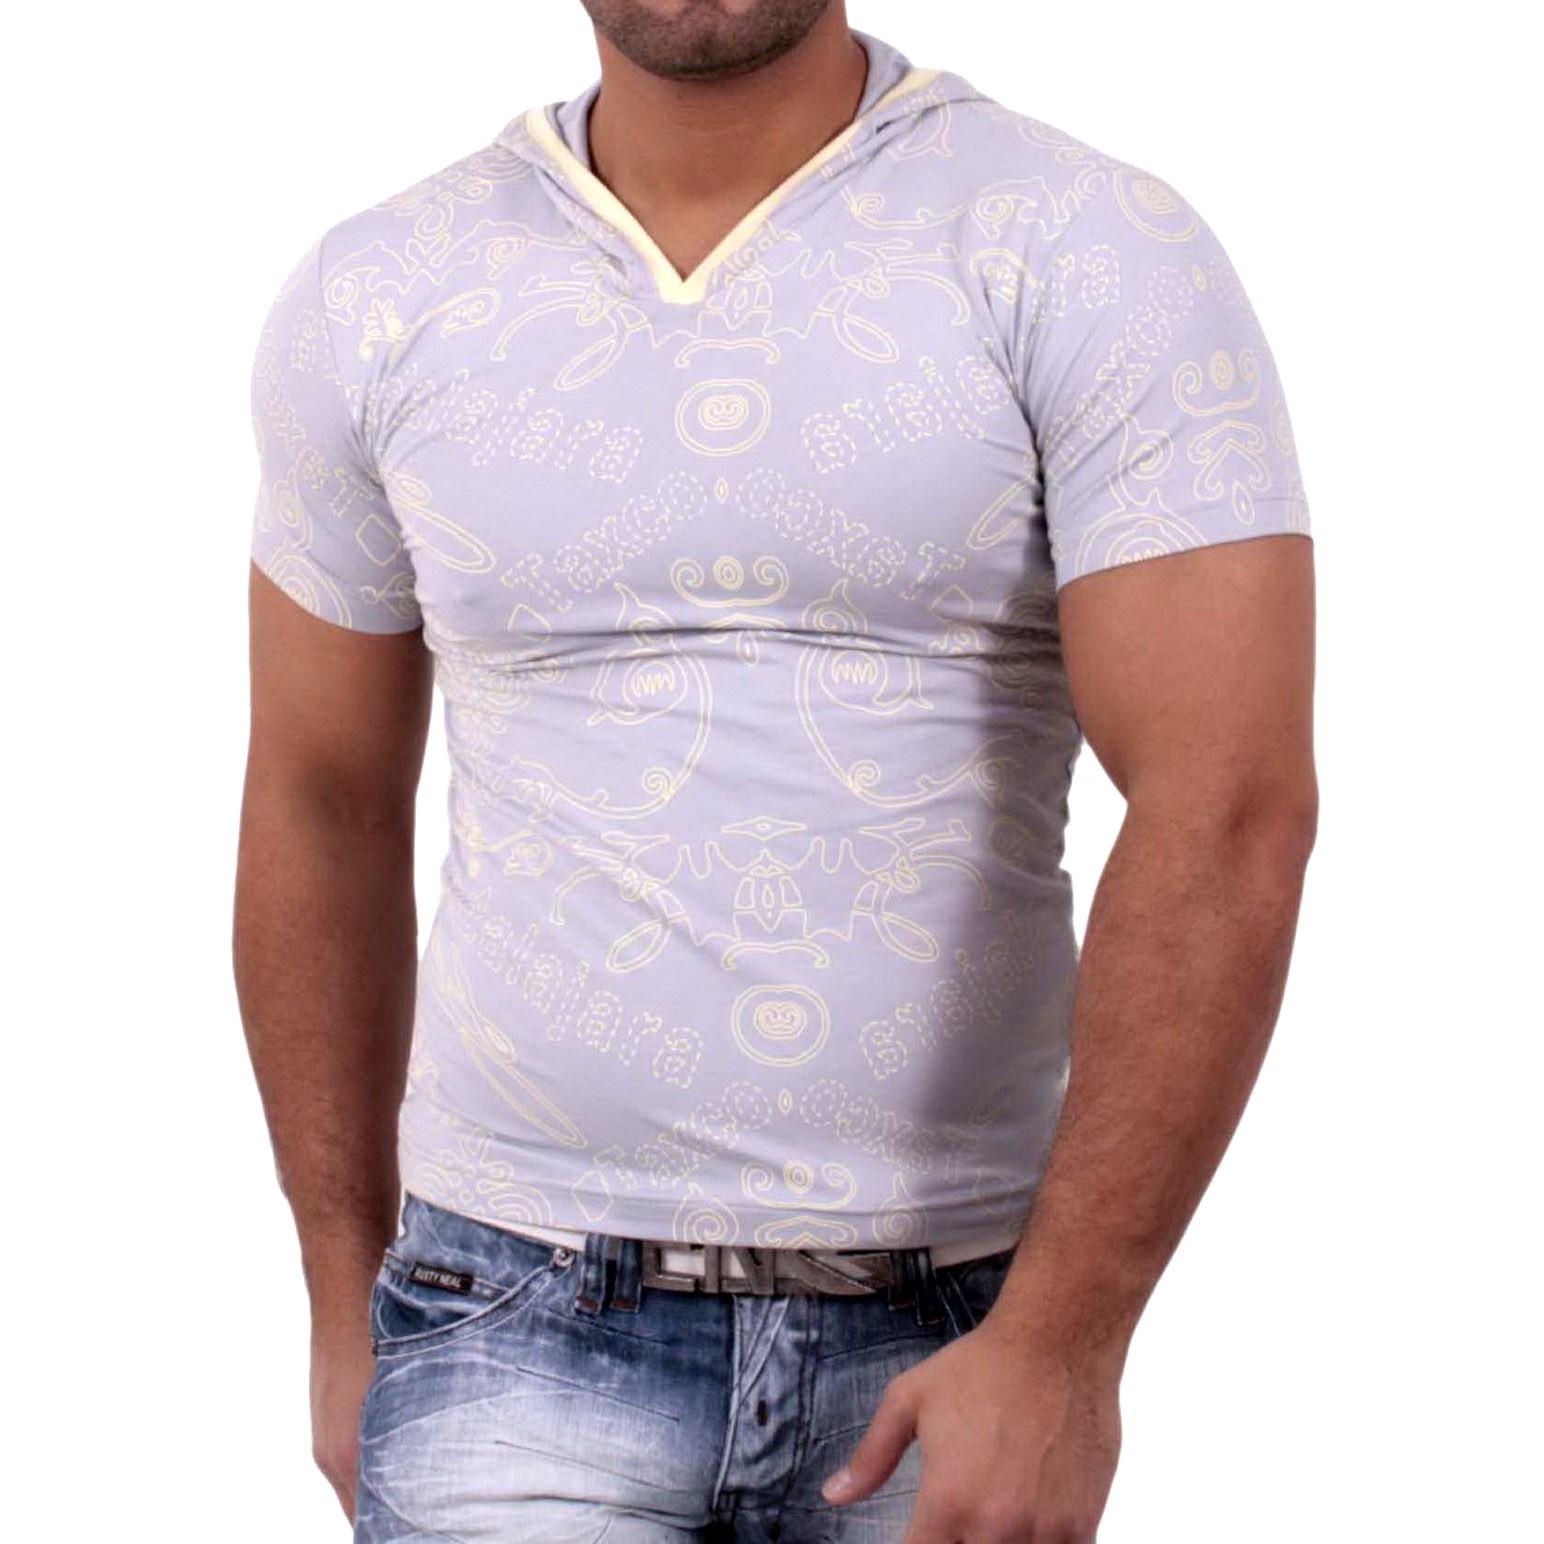 Rusty Neal Kurzarm Slim Fit Herren Kapuzen Shirt Motiv T-Shirt Grau RN-1651